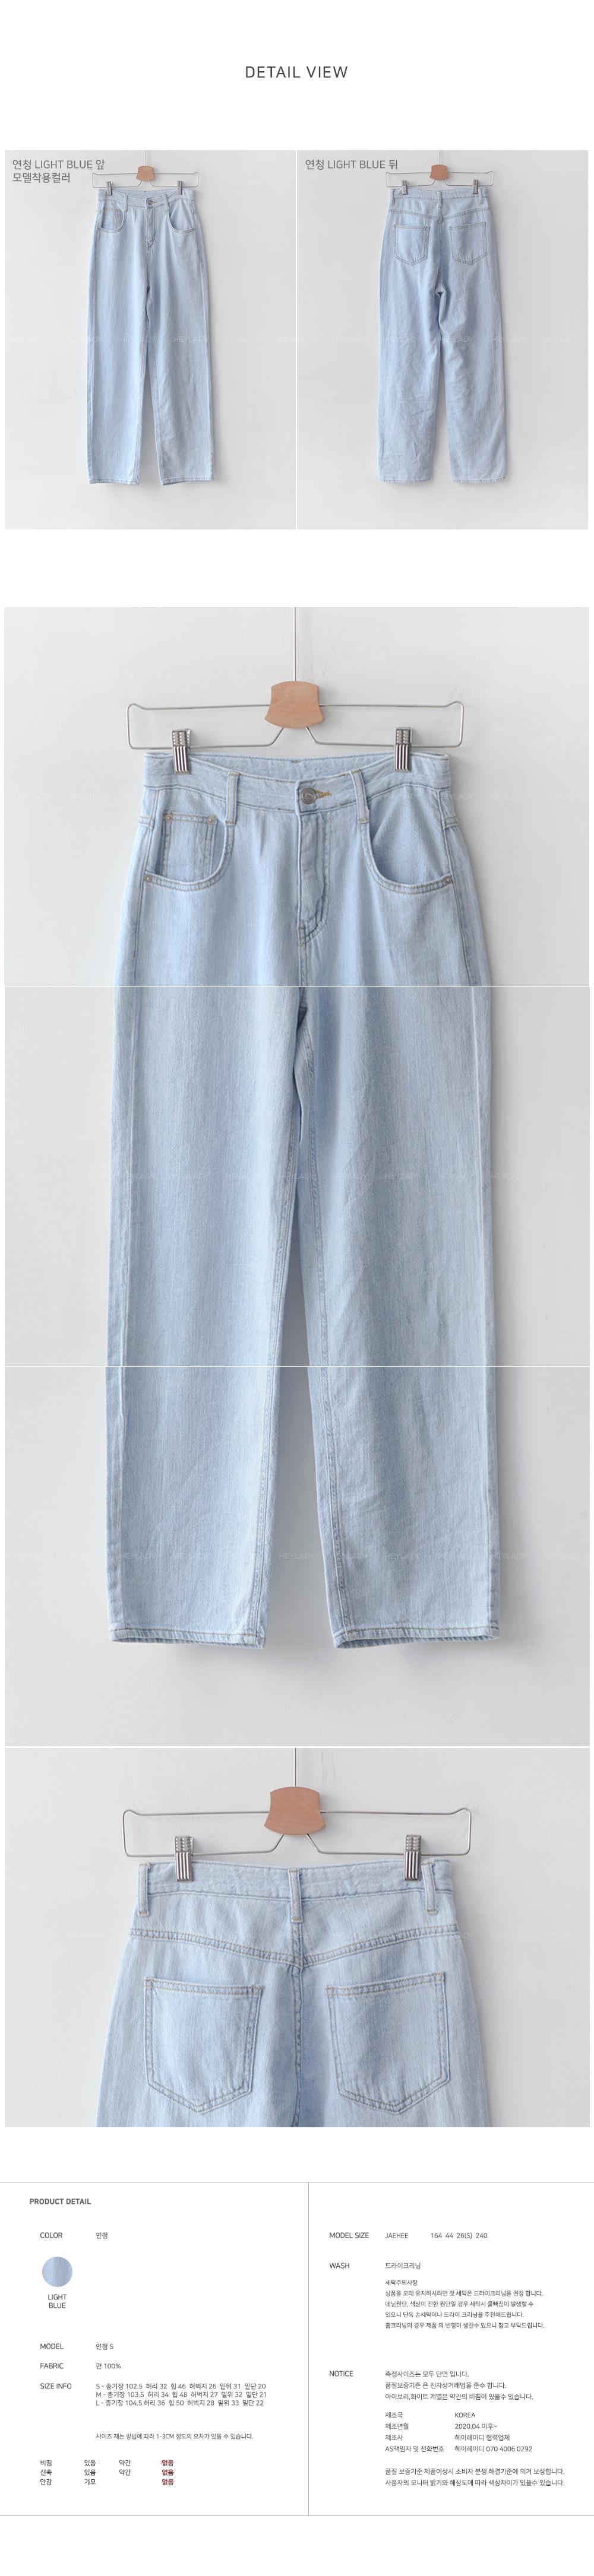 Herty Wide Denim Pants